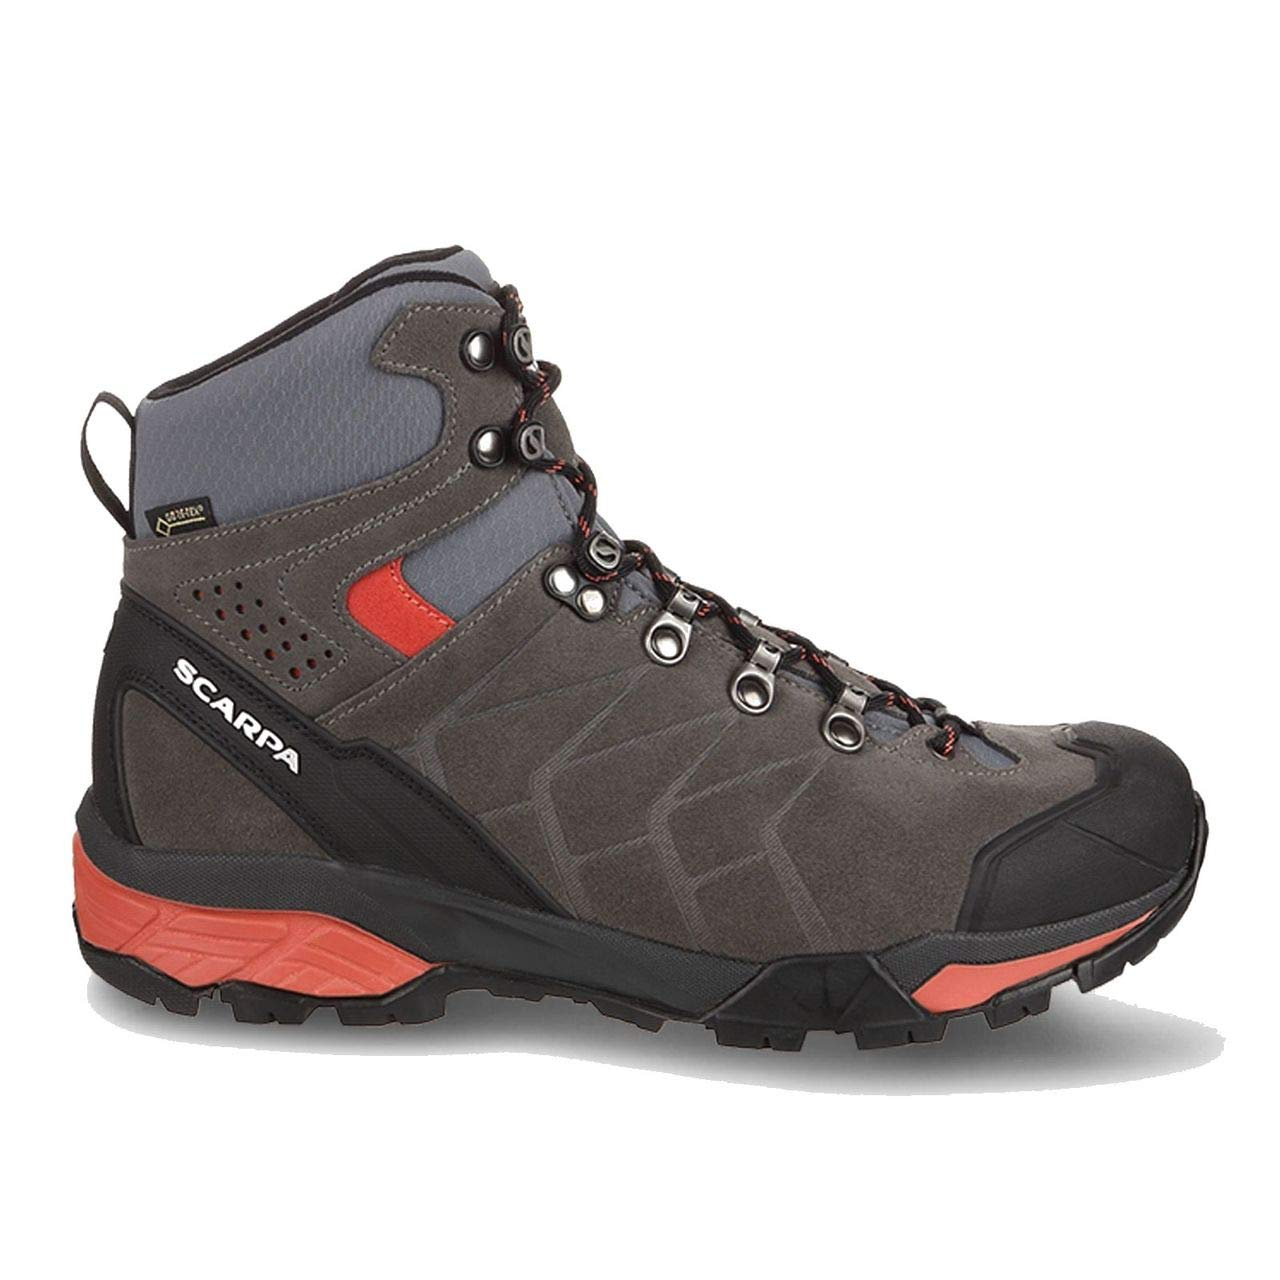 SCARPA ZG Trek GTX Backpacking Boot - Women's Titanium/Red Ibiscus, 40.0 by SCARPA